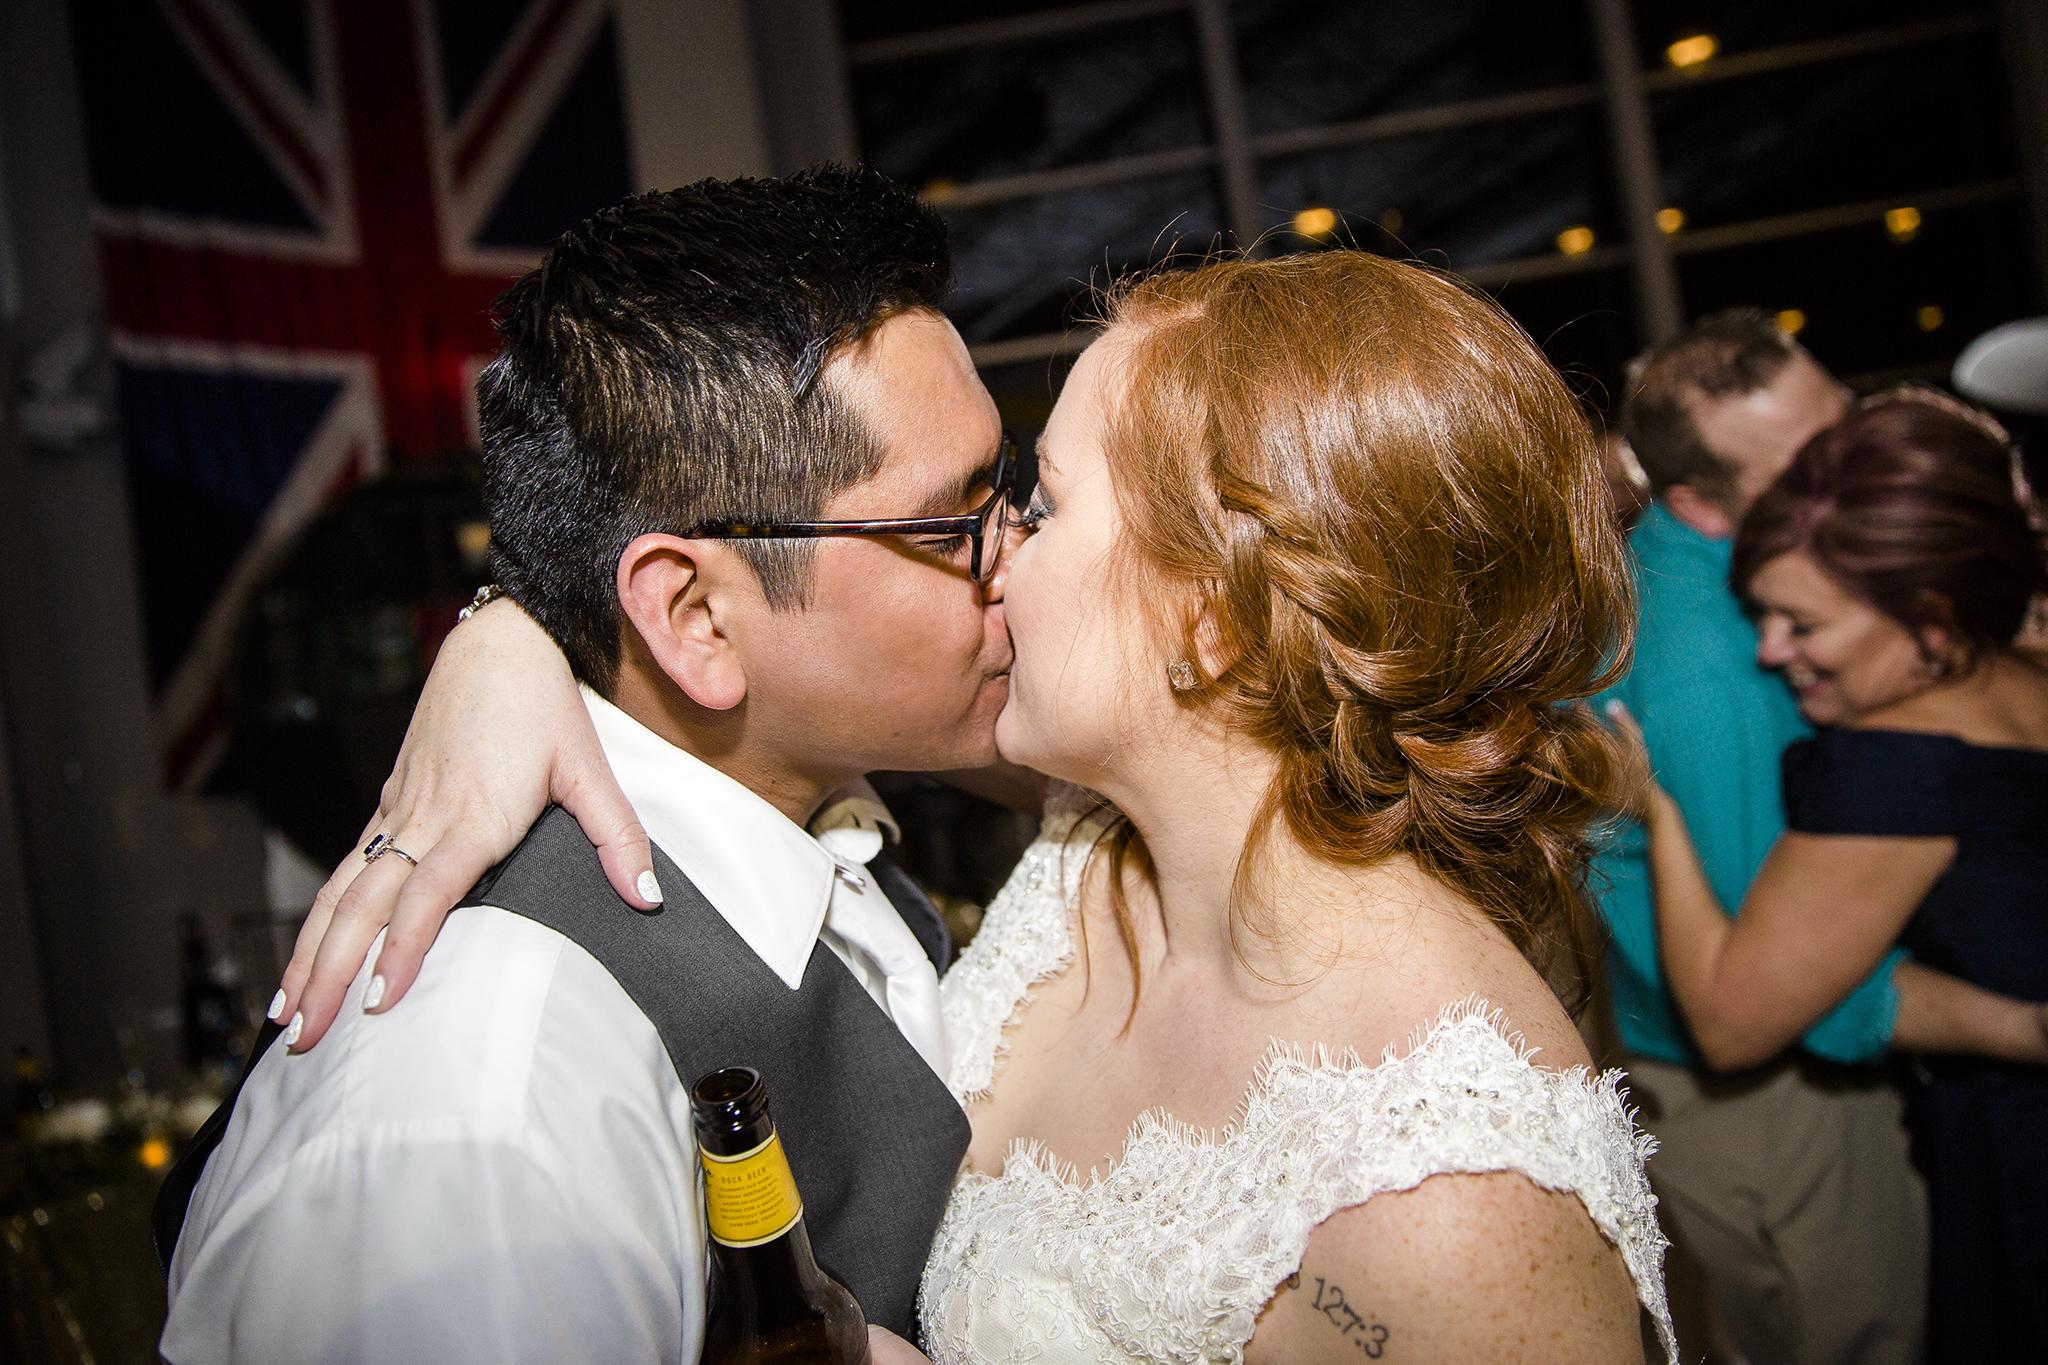 bride and groom kiss, wedding reception, romantic, fun wedding reception